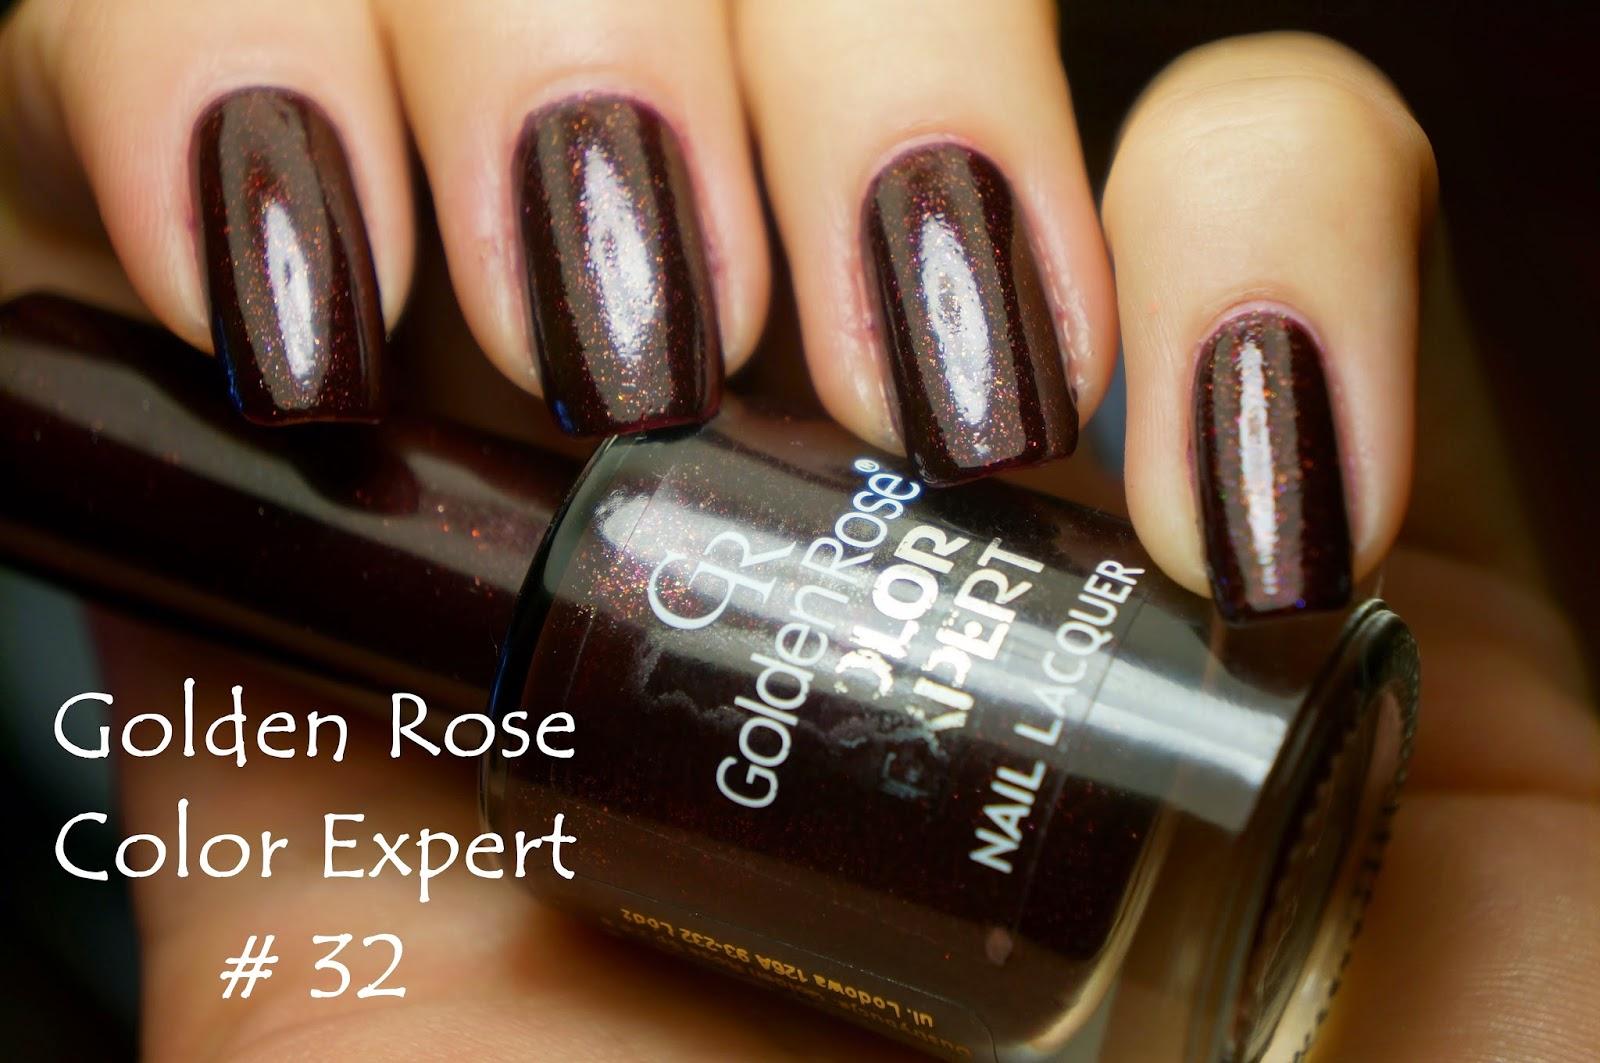 Golden Rose color expert #32 , czyli kosmiczne bordo